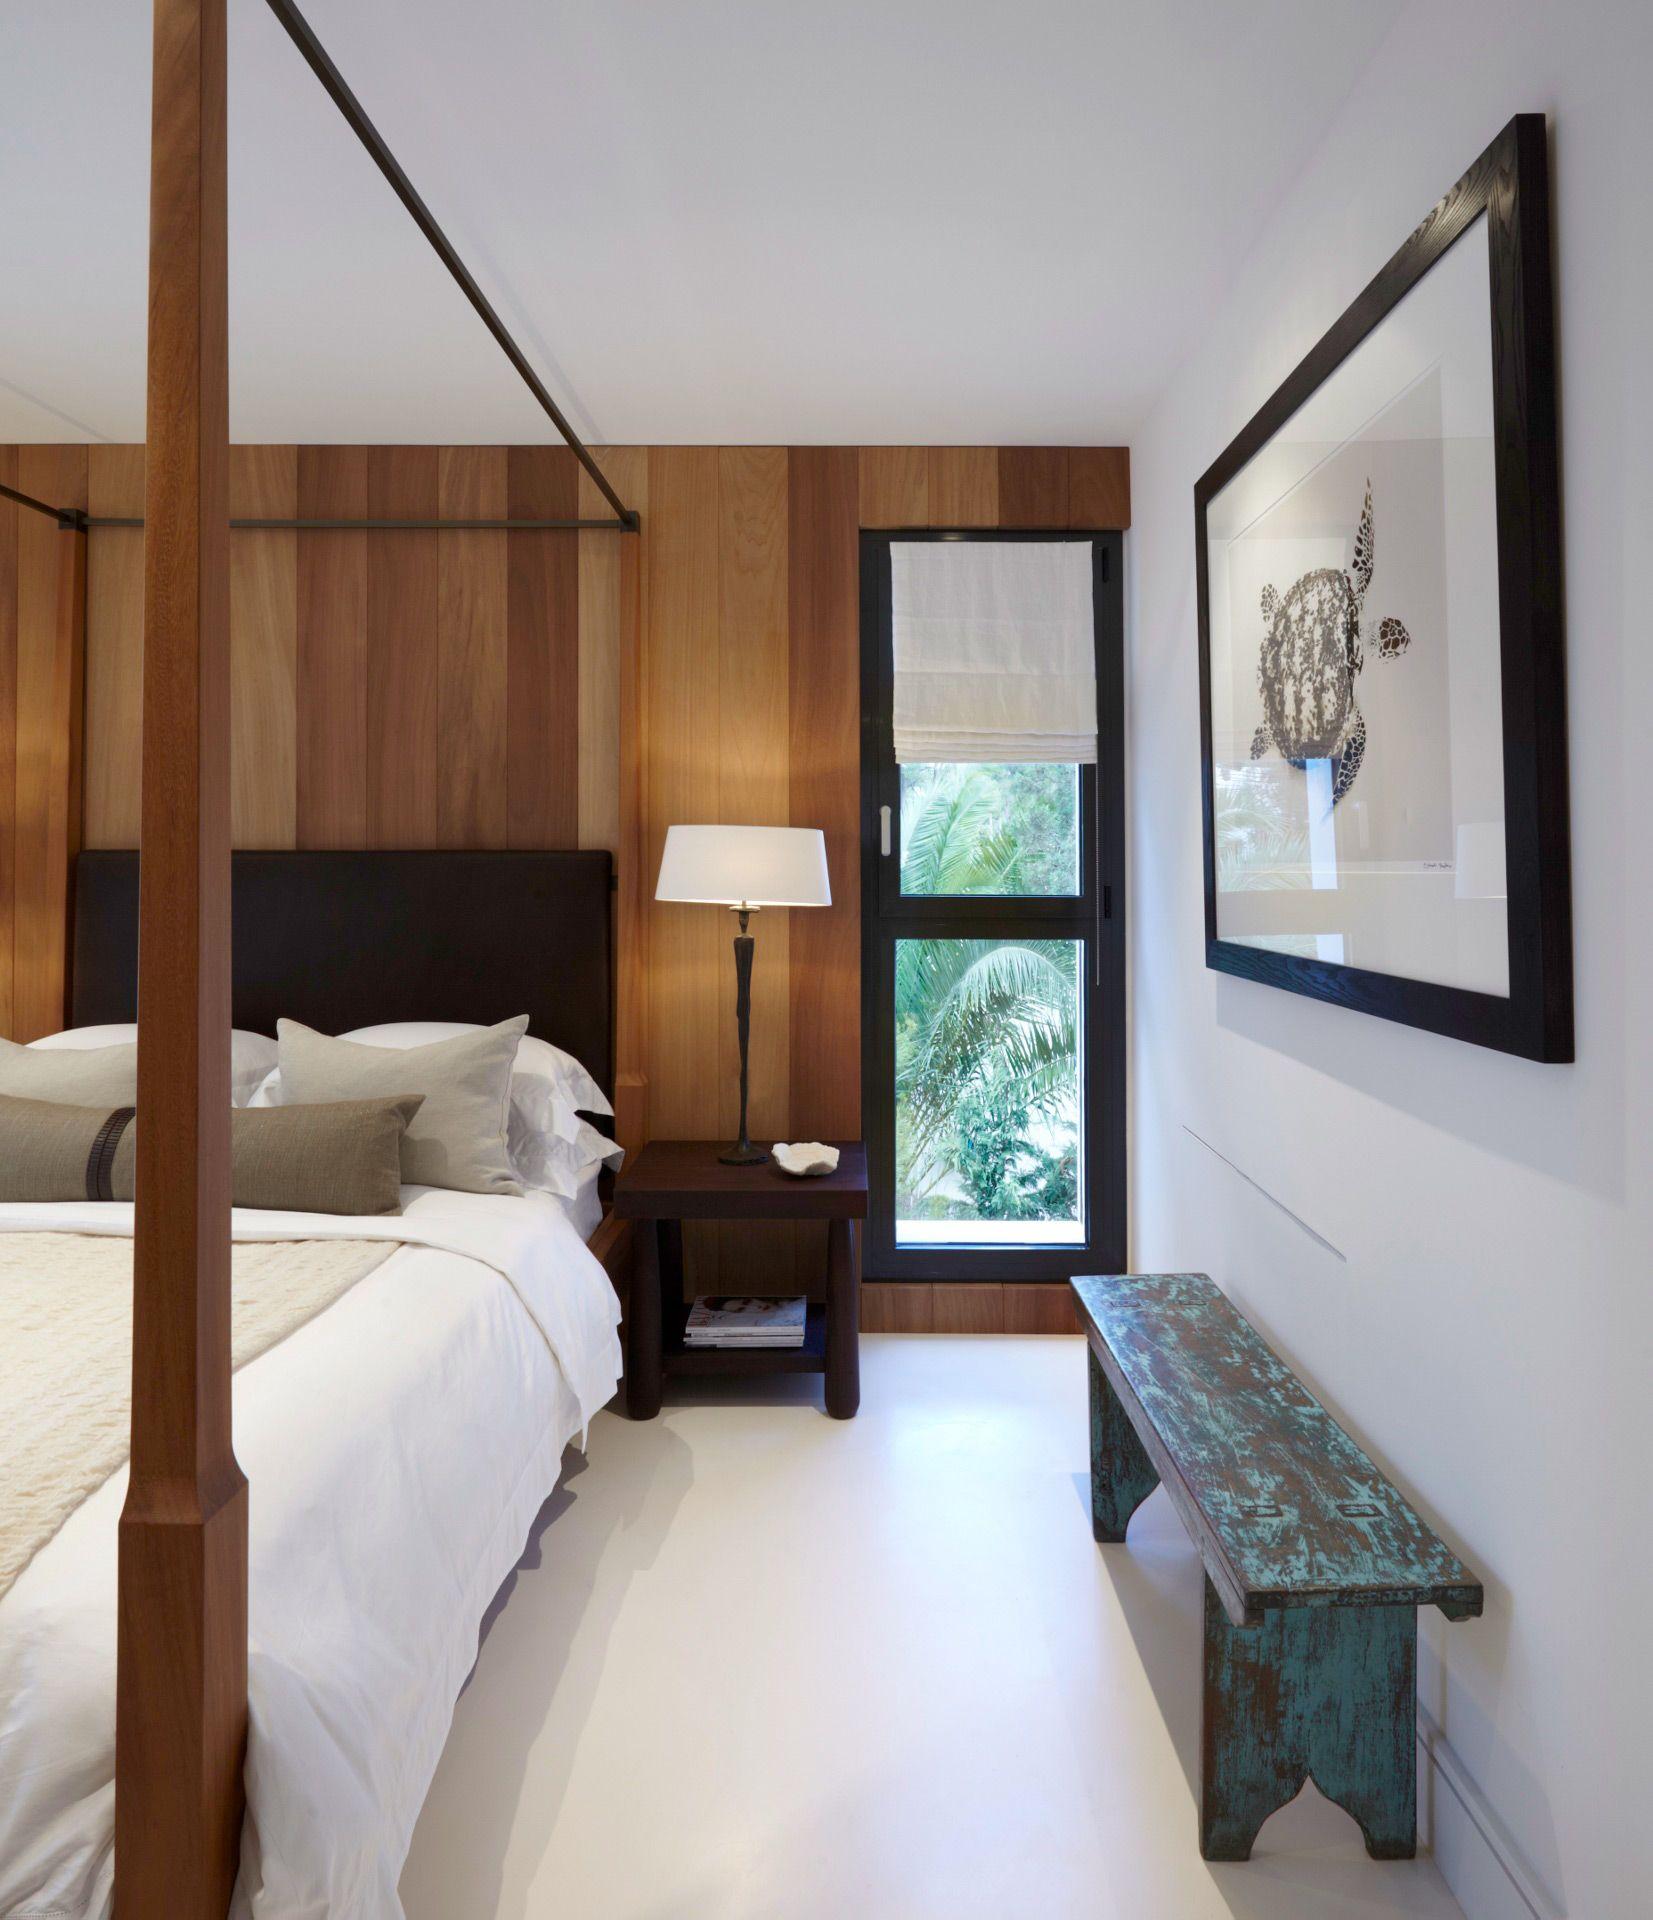 Private Residence, Beach House, Balearic Islands - Fiona Barratt ...